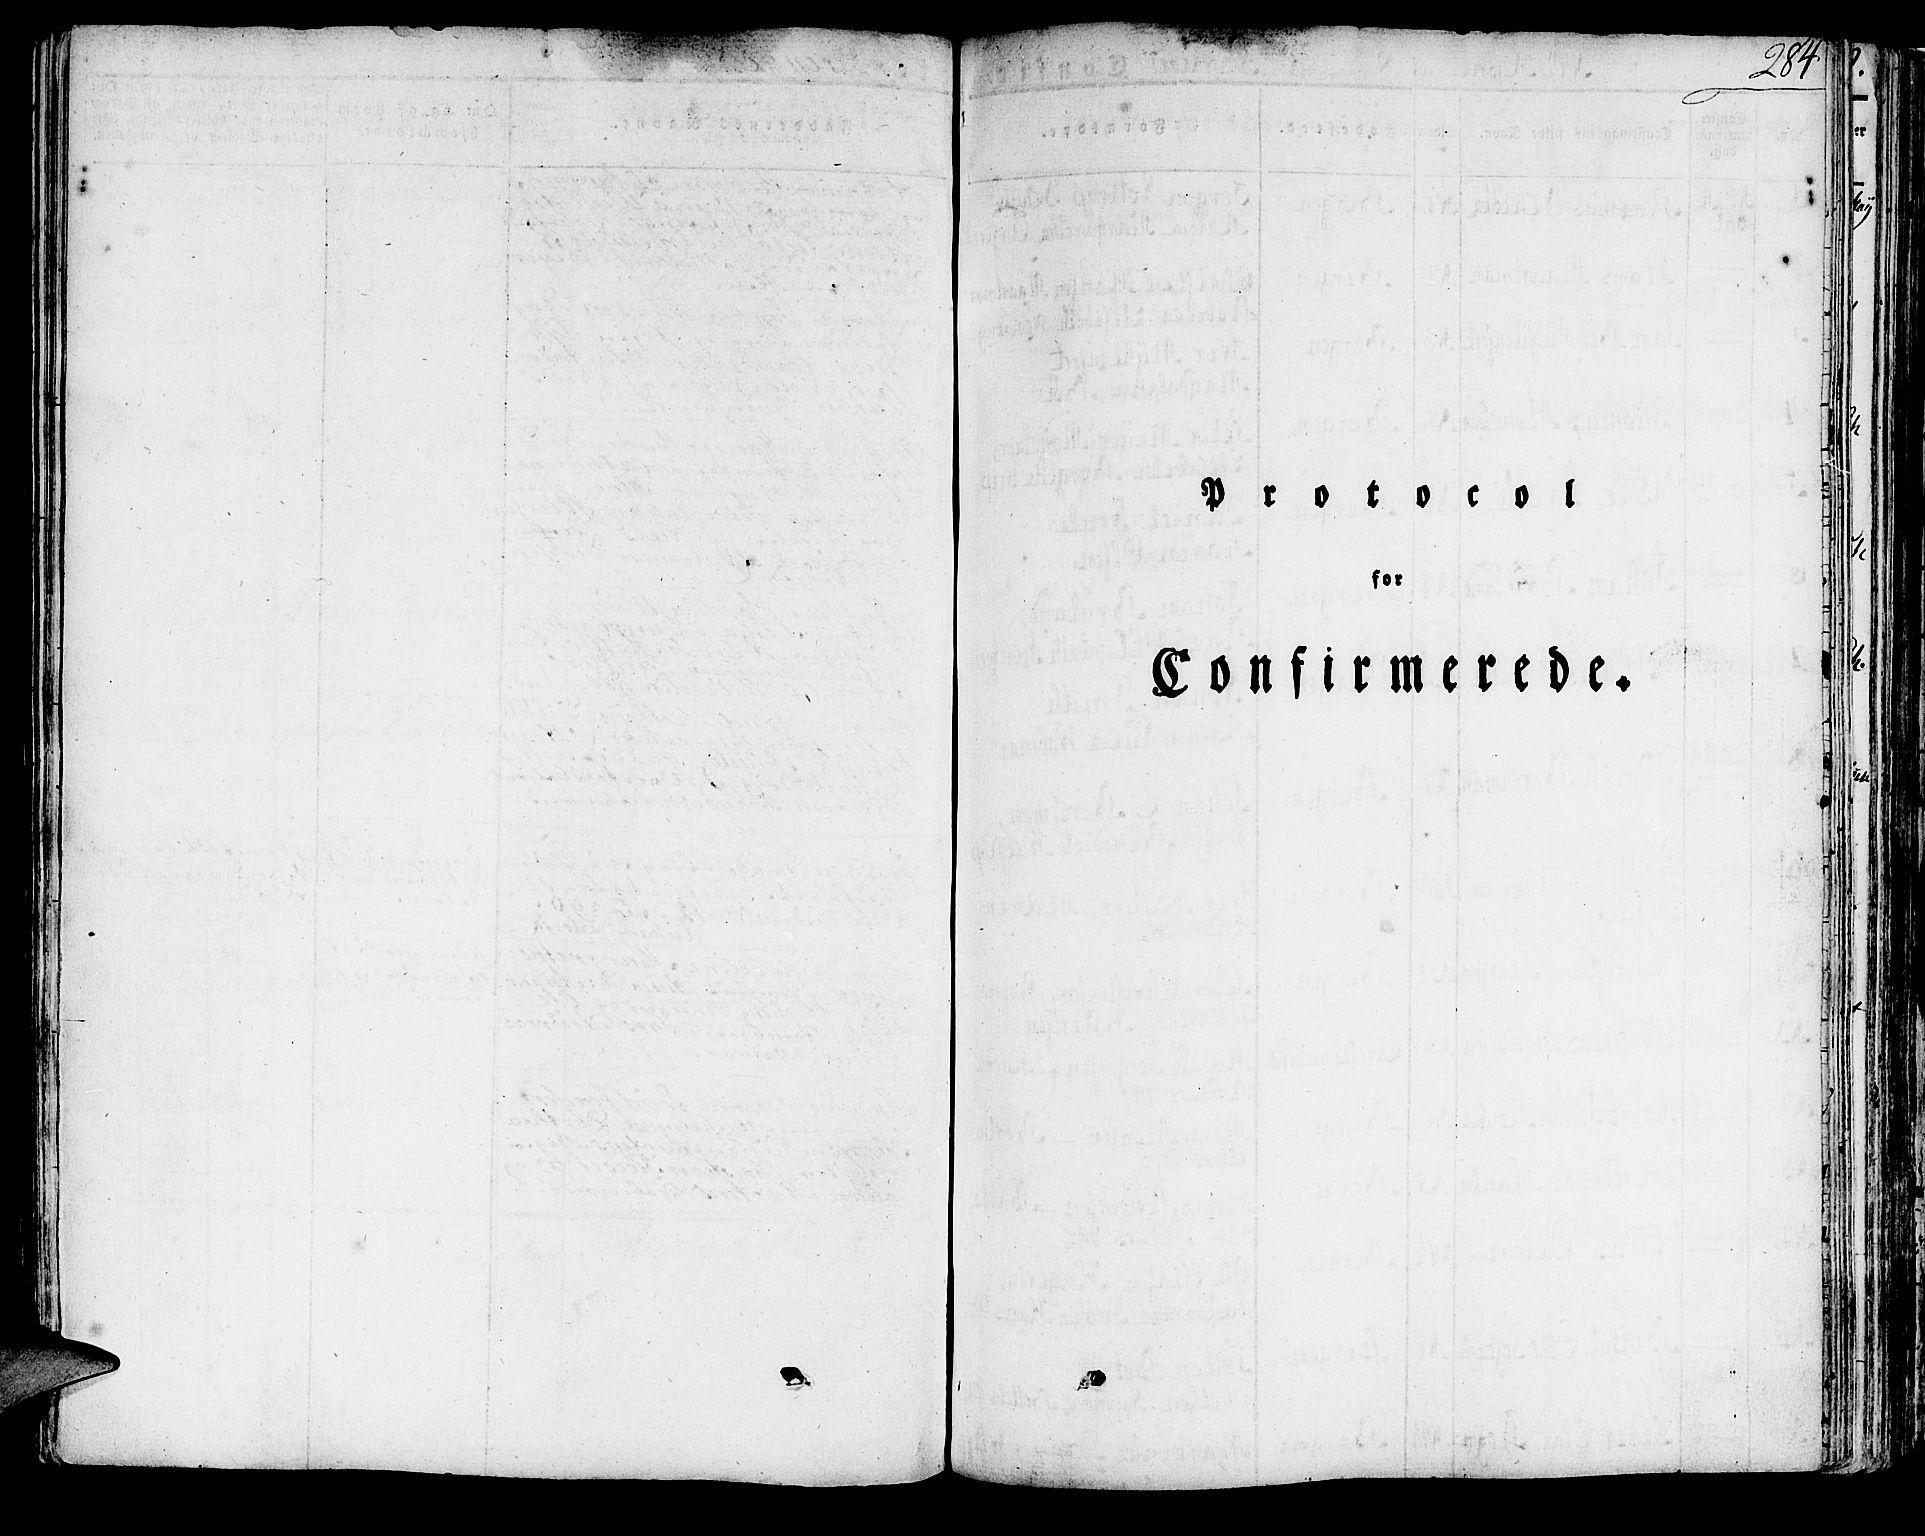 SAB, Domkirken Sokneprestembete, H/Haa/L0012: Ministerialbok nr. A 12, 1821-1840, s. 284